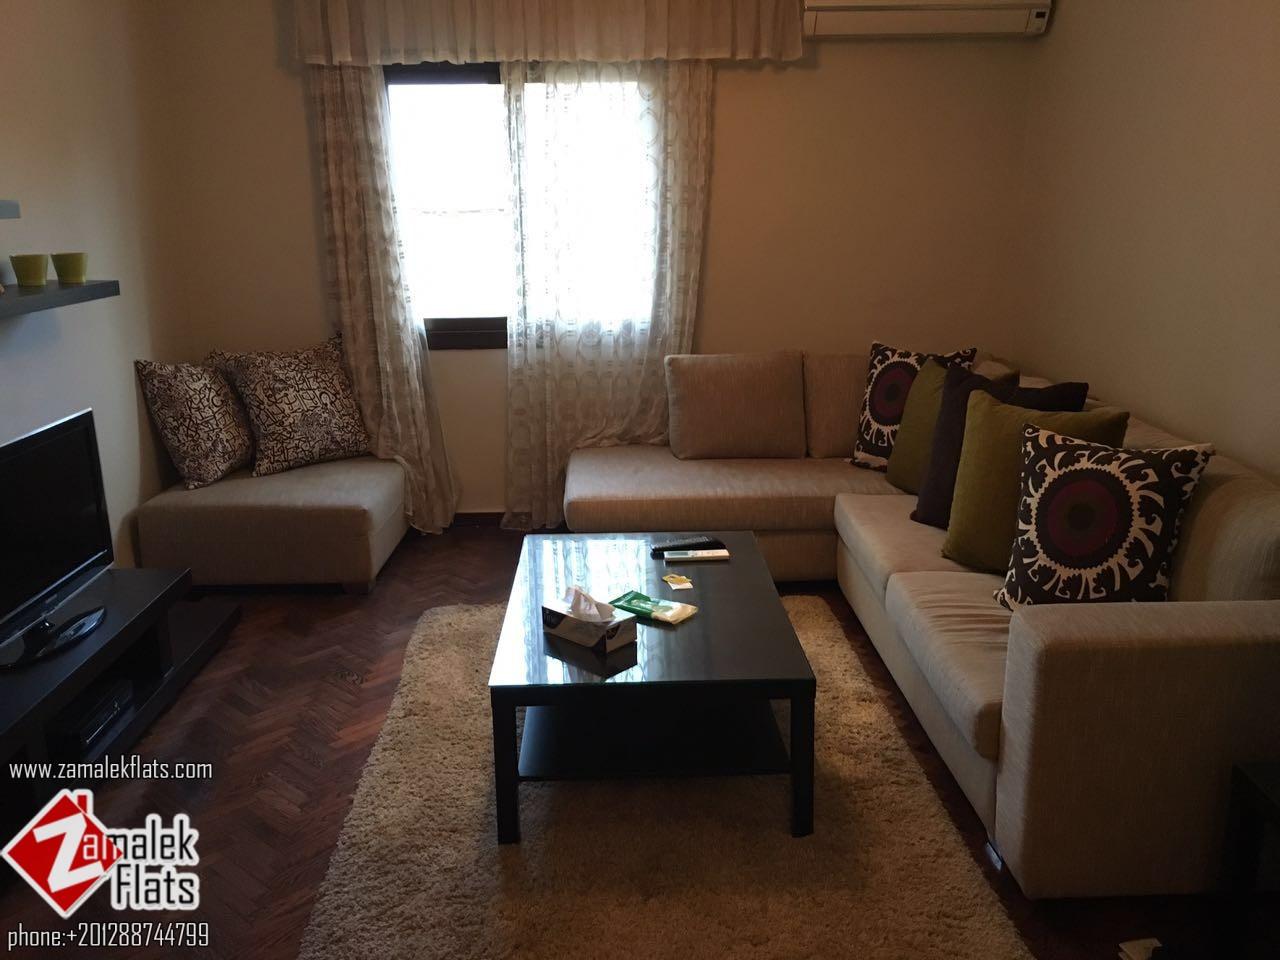 Modern fully furnished apartment for rent in Brazil st., zamalek